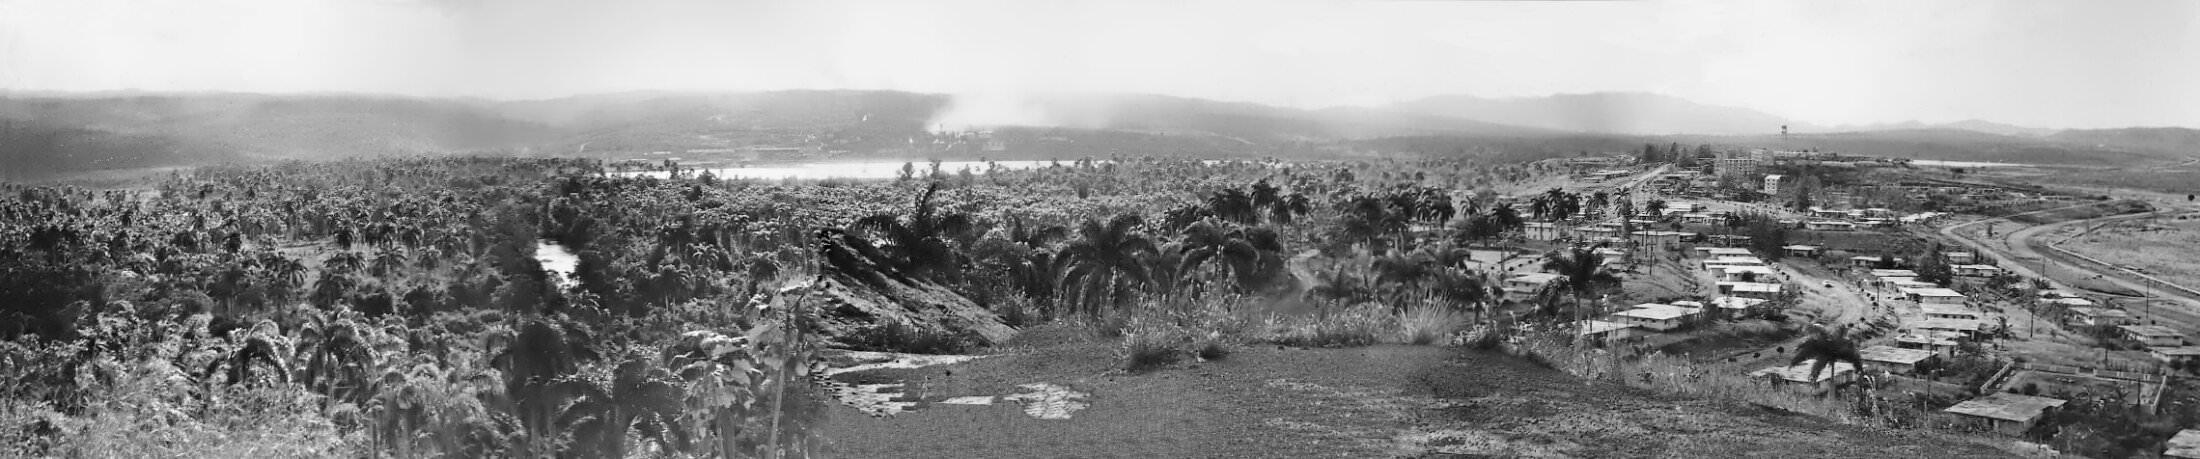 1964-1966. Панорама Моа. Фото 3.